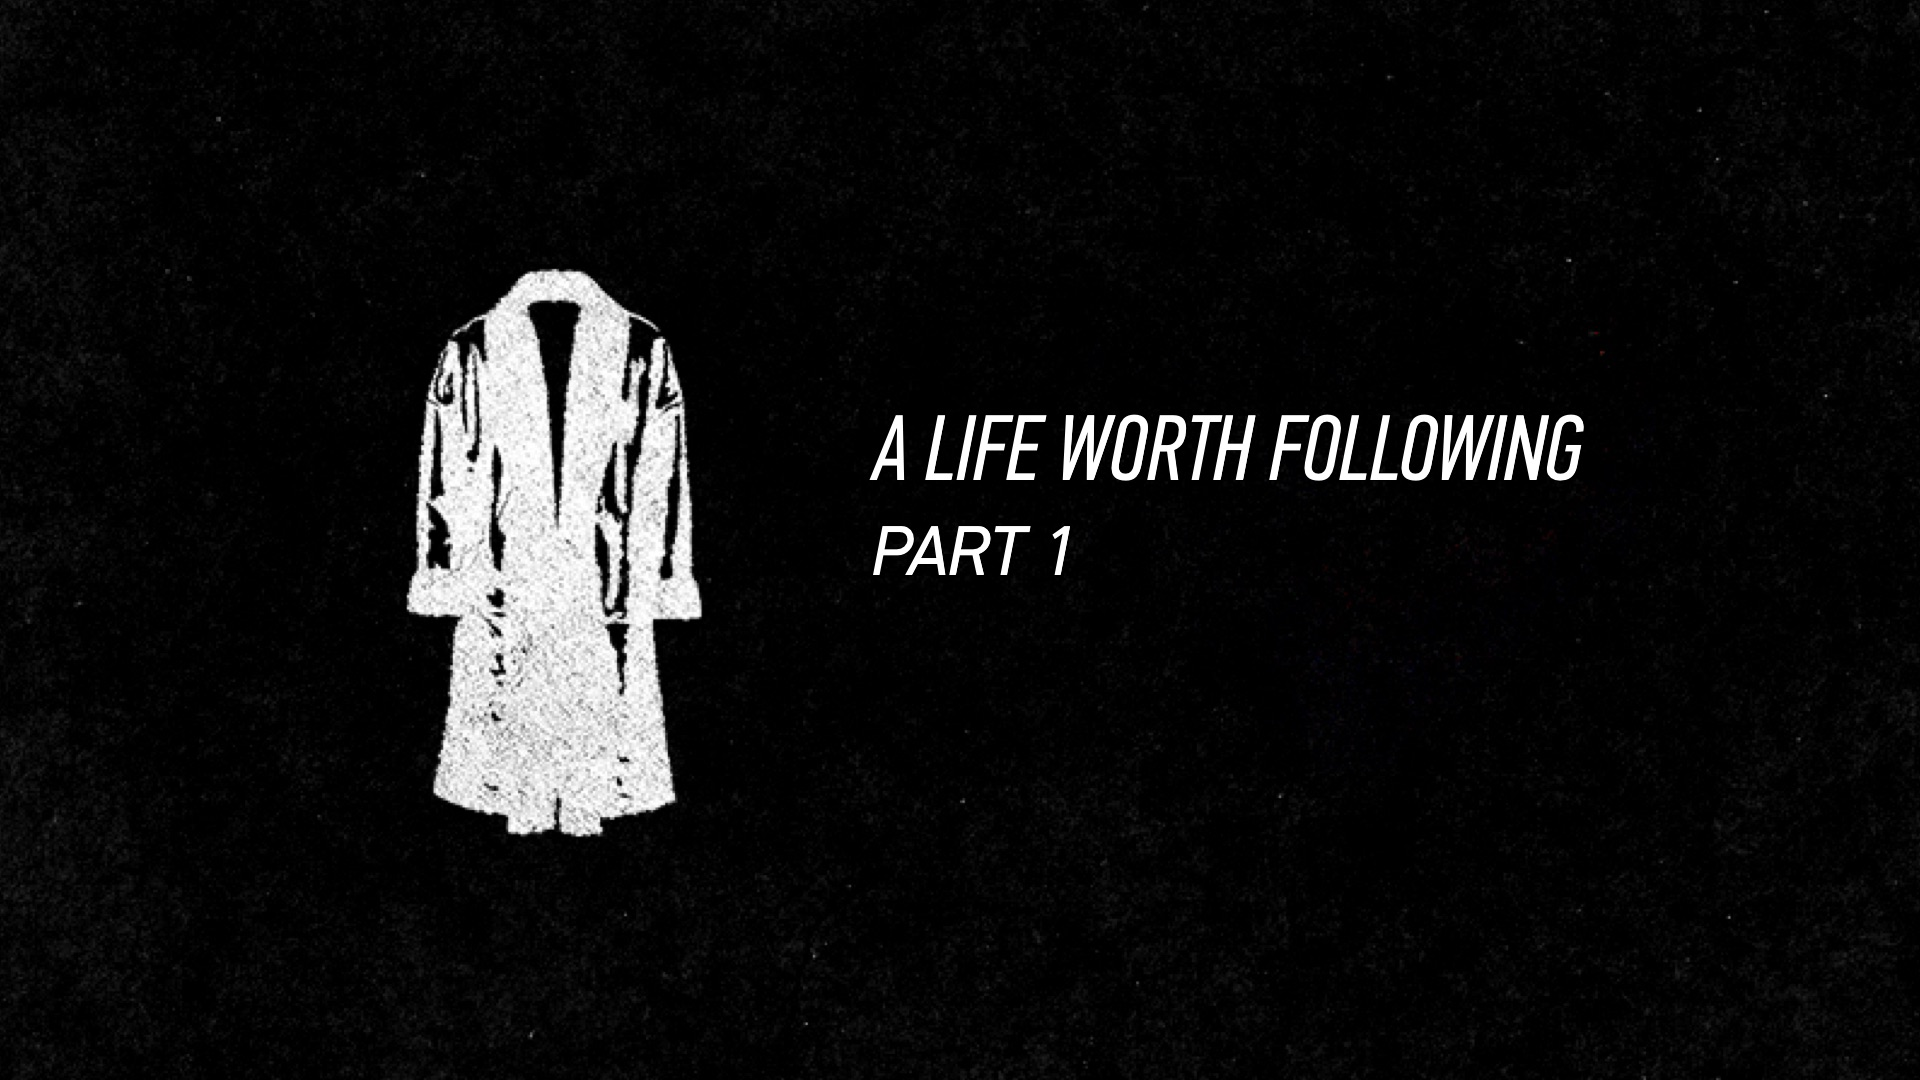 20160424 A Life Worth Following - Part 1.jpg